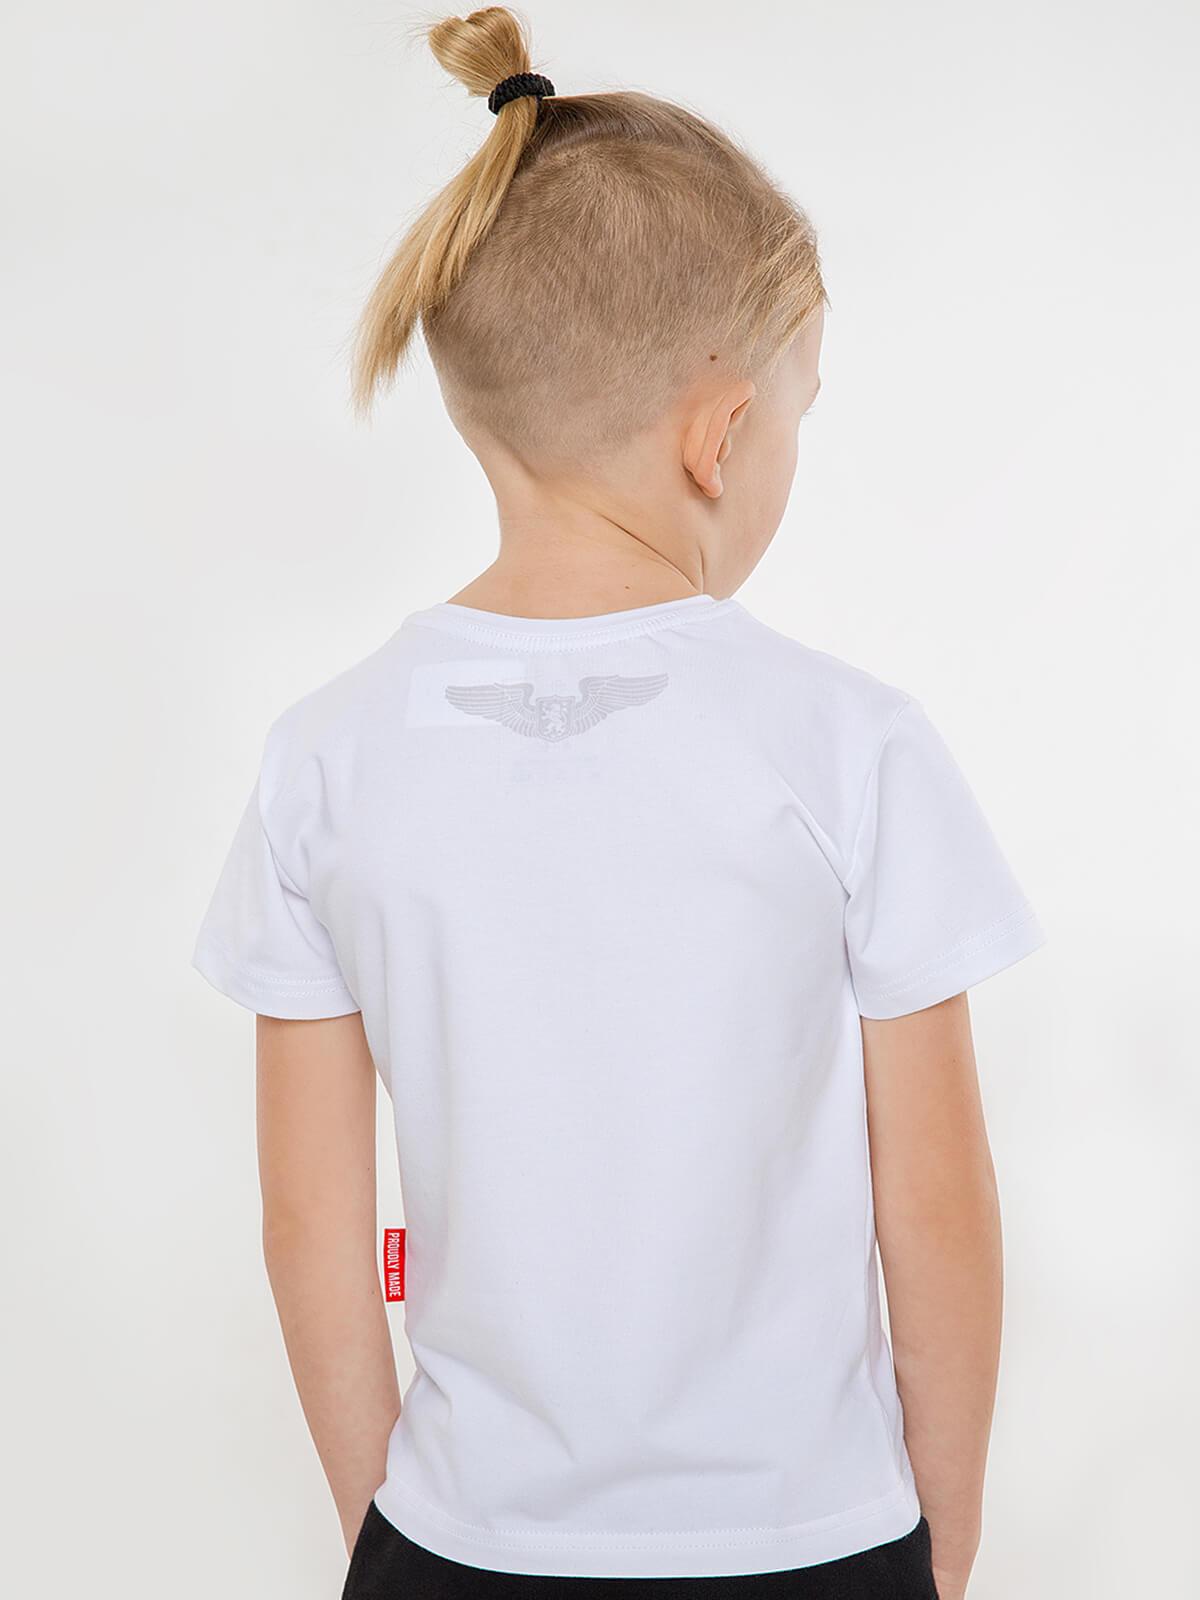 Kids T-Shirt Su-27. Color white. 4.